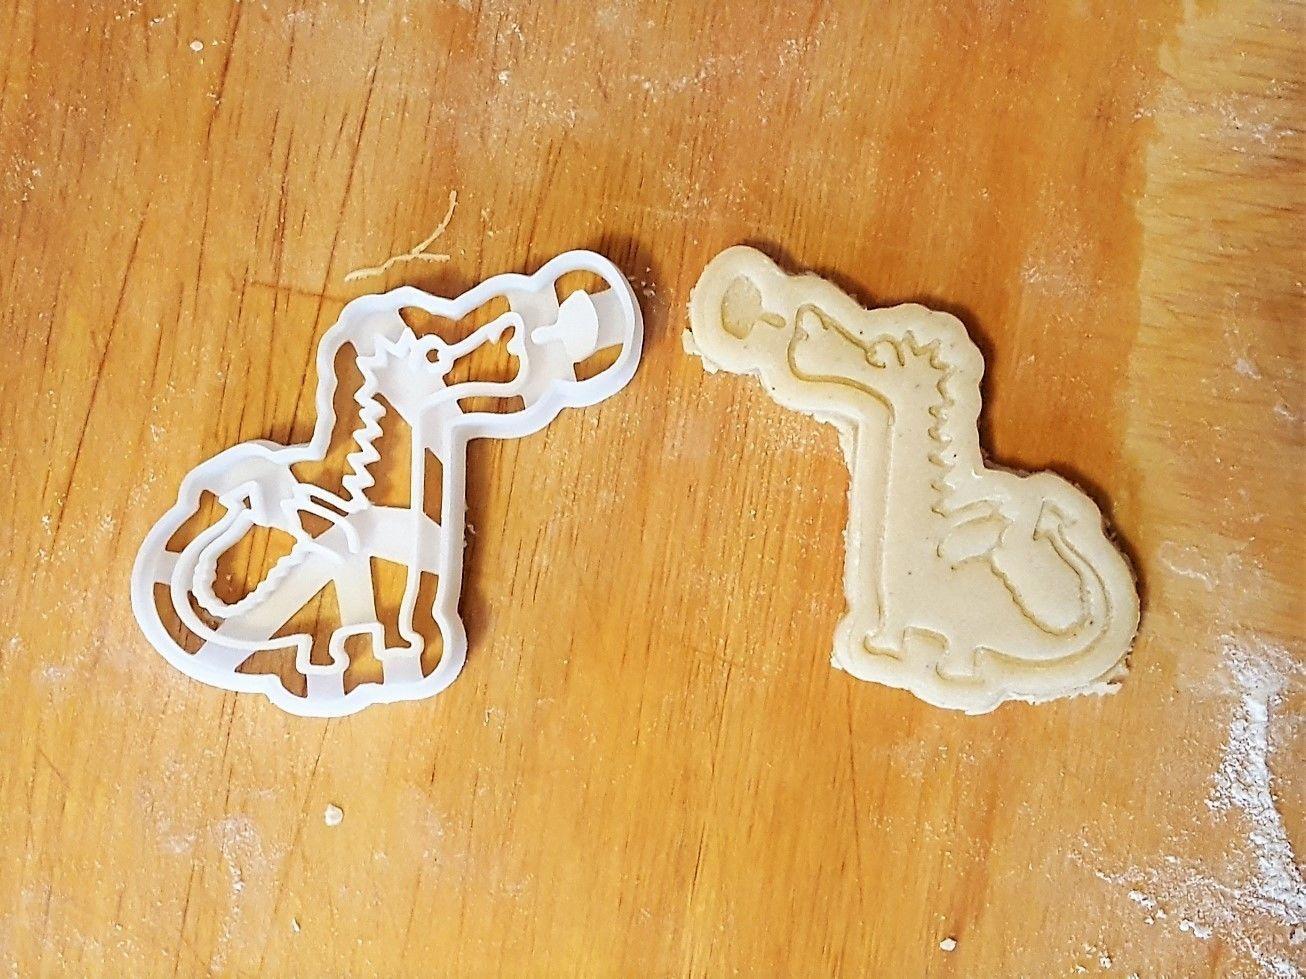 Dragon cookie cutter